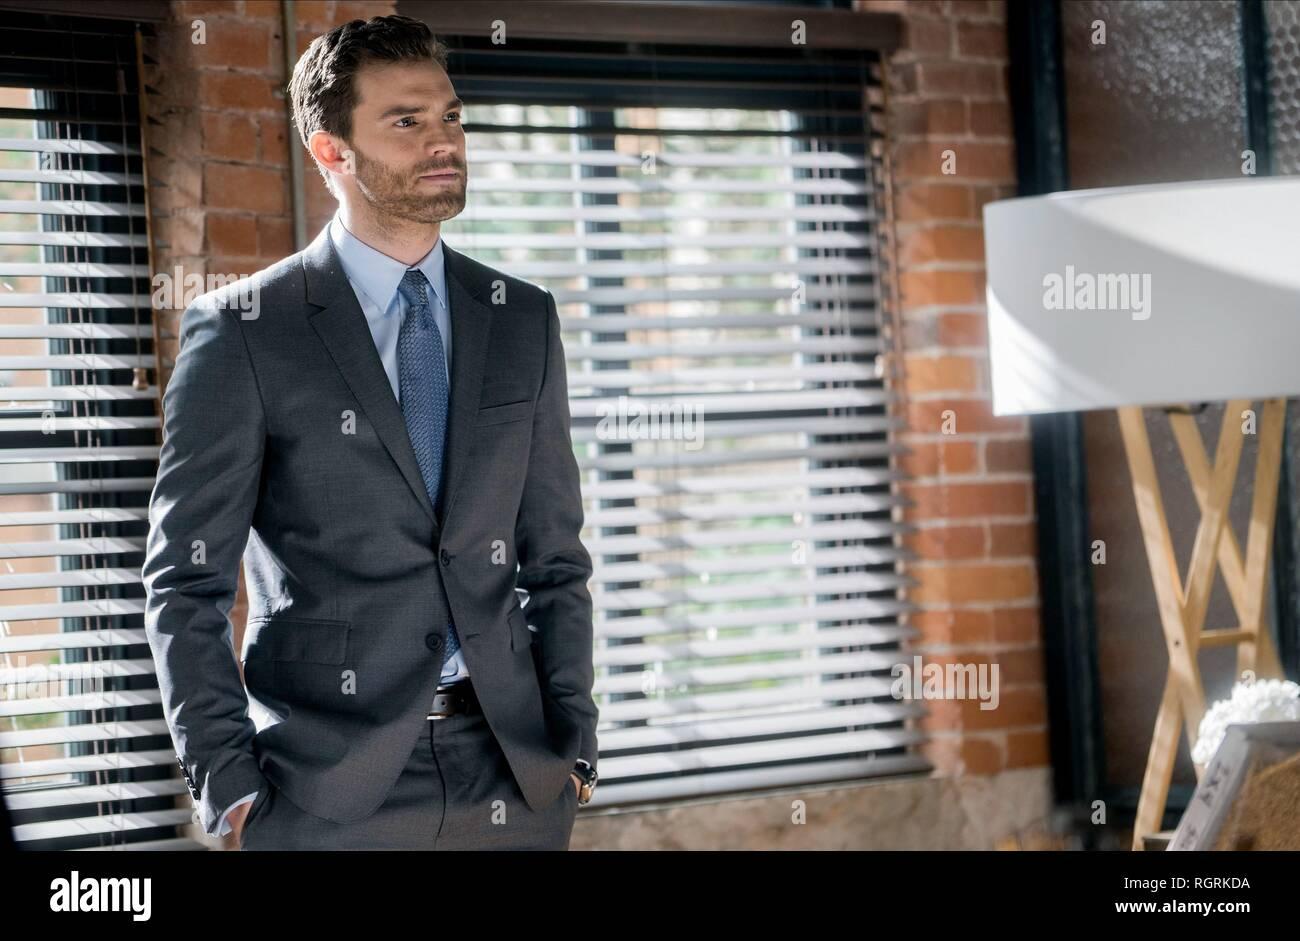 Jamie Dornan Fifty Shades Freed 2018 Stock Photo Alamy